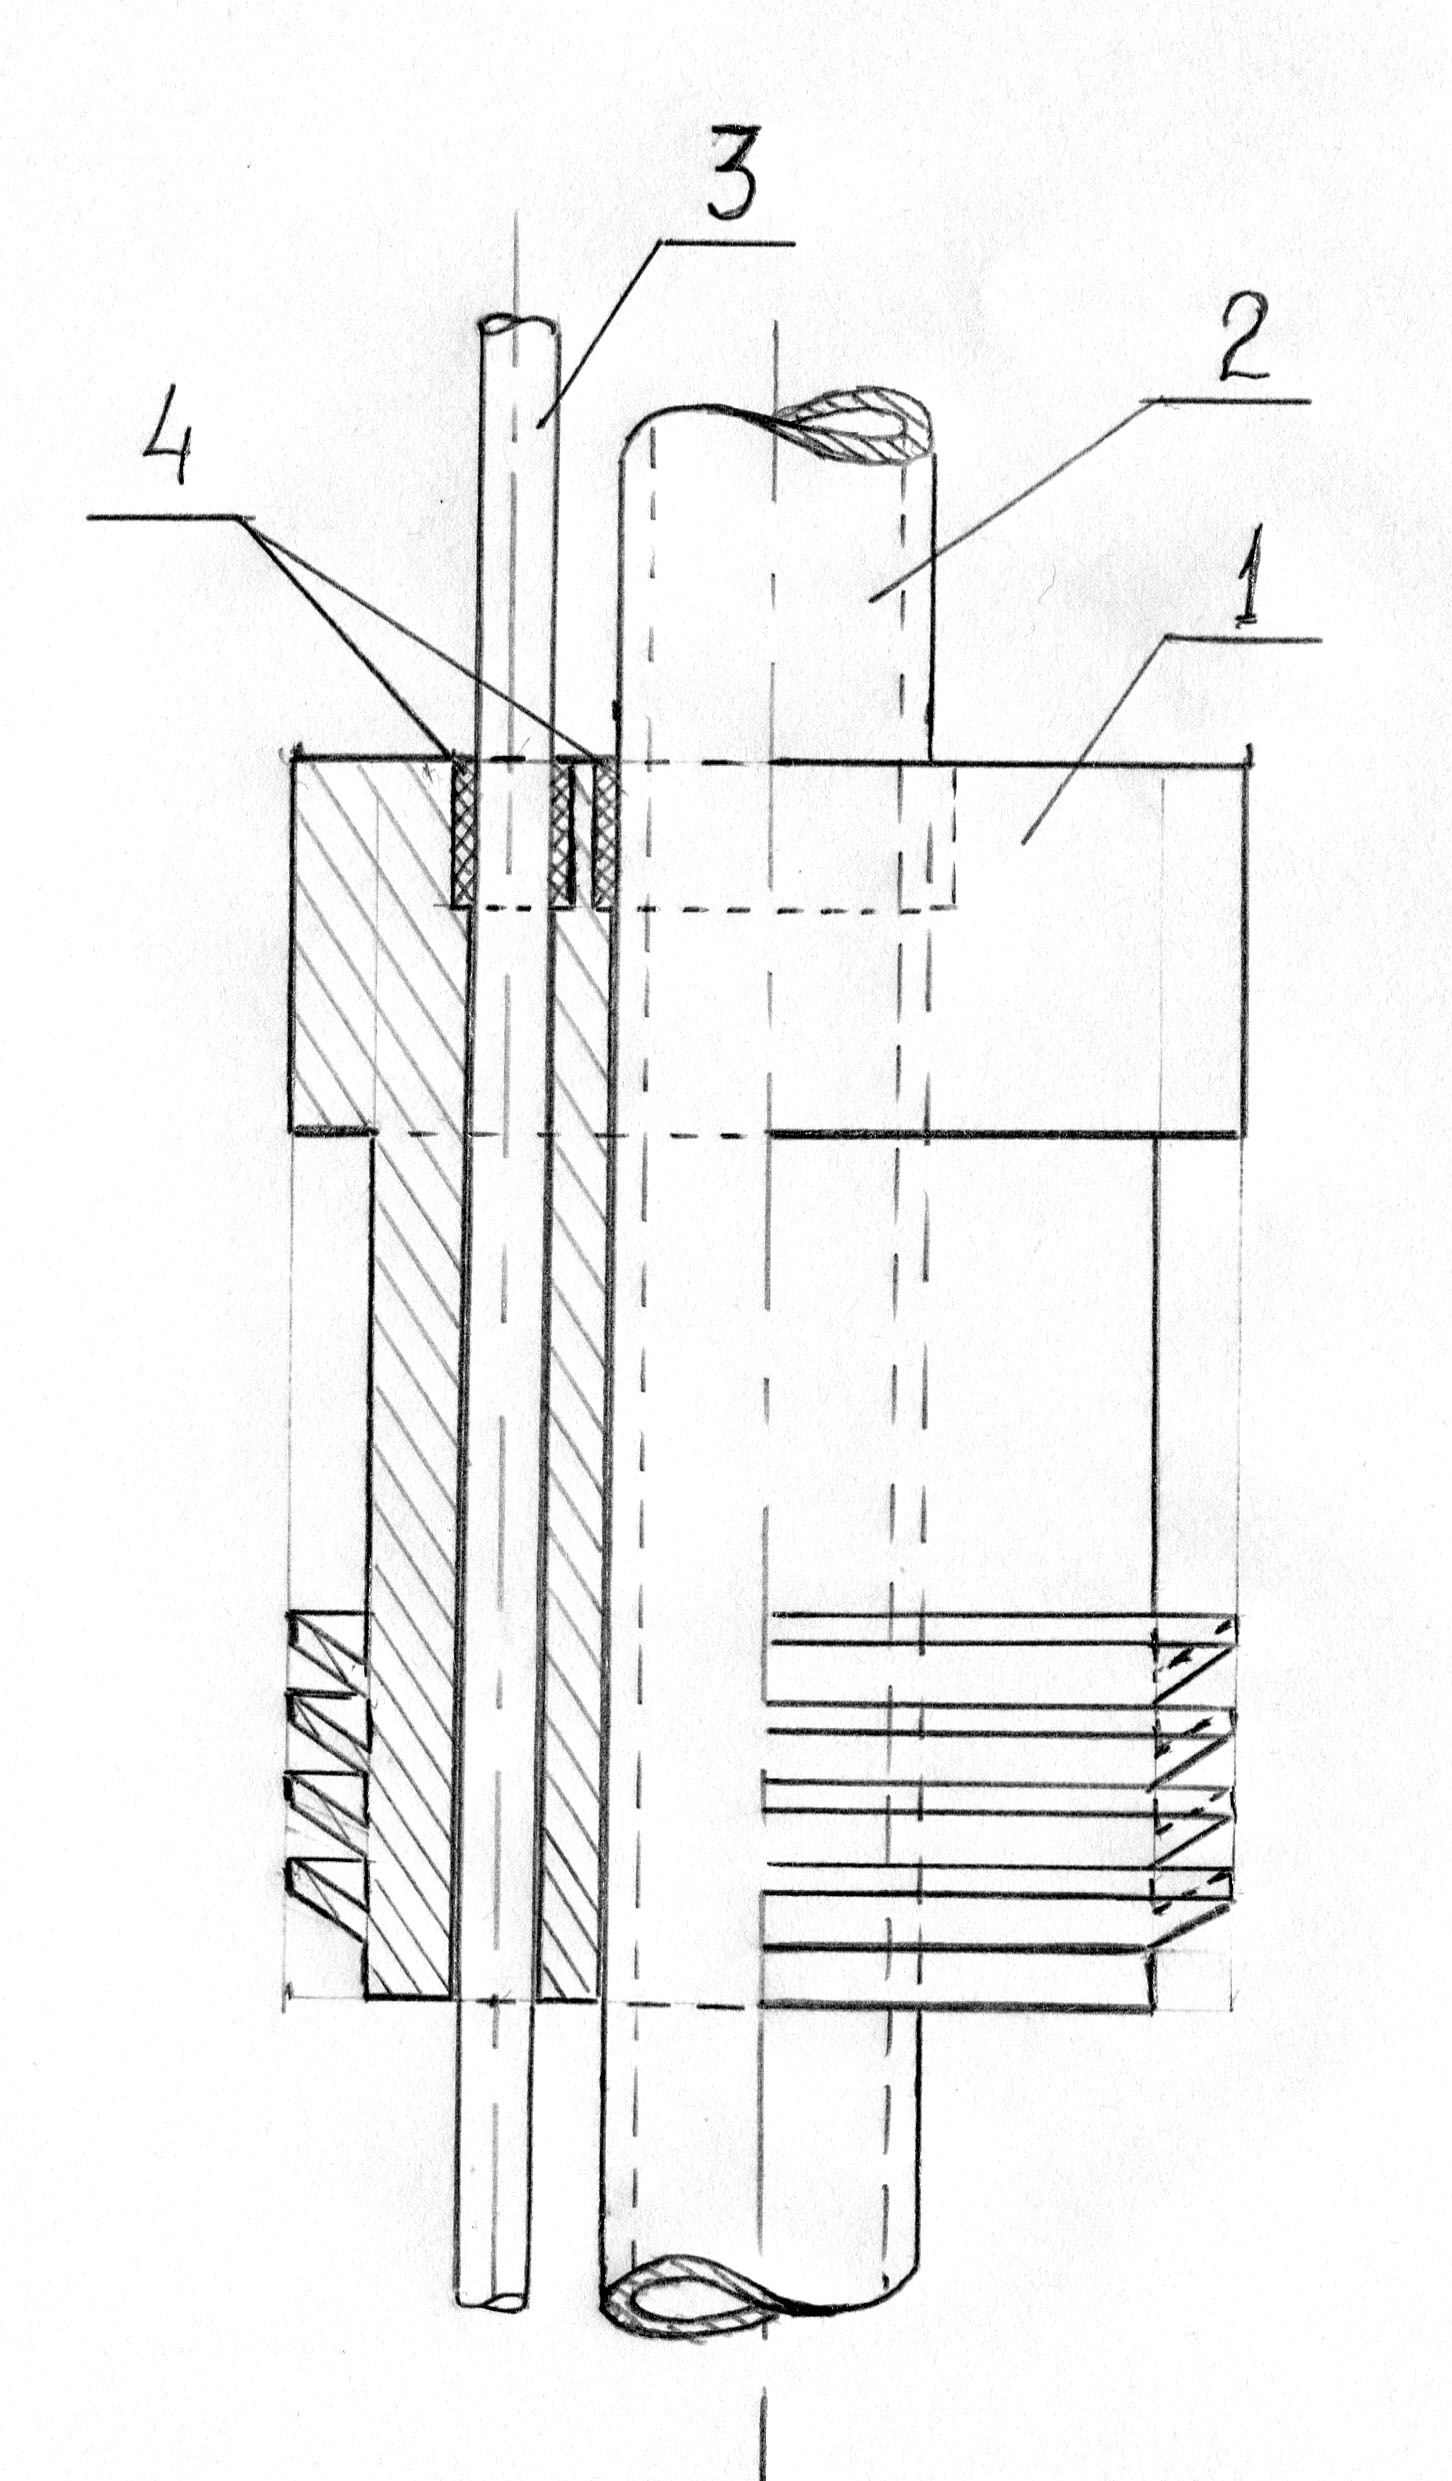 Конструкция пробки концентратора